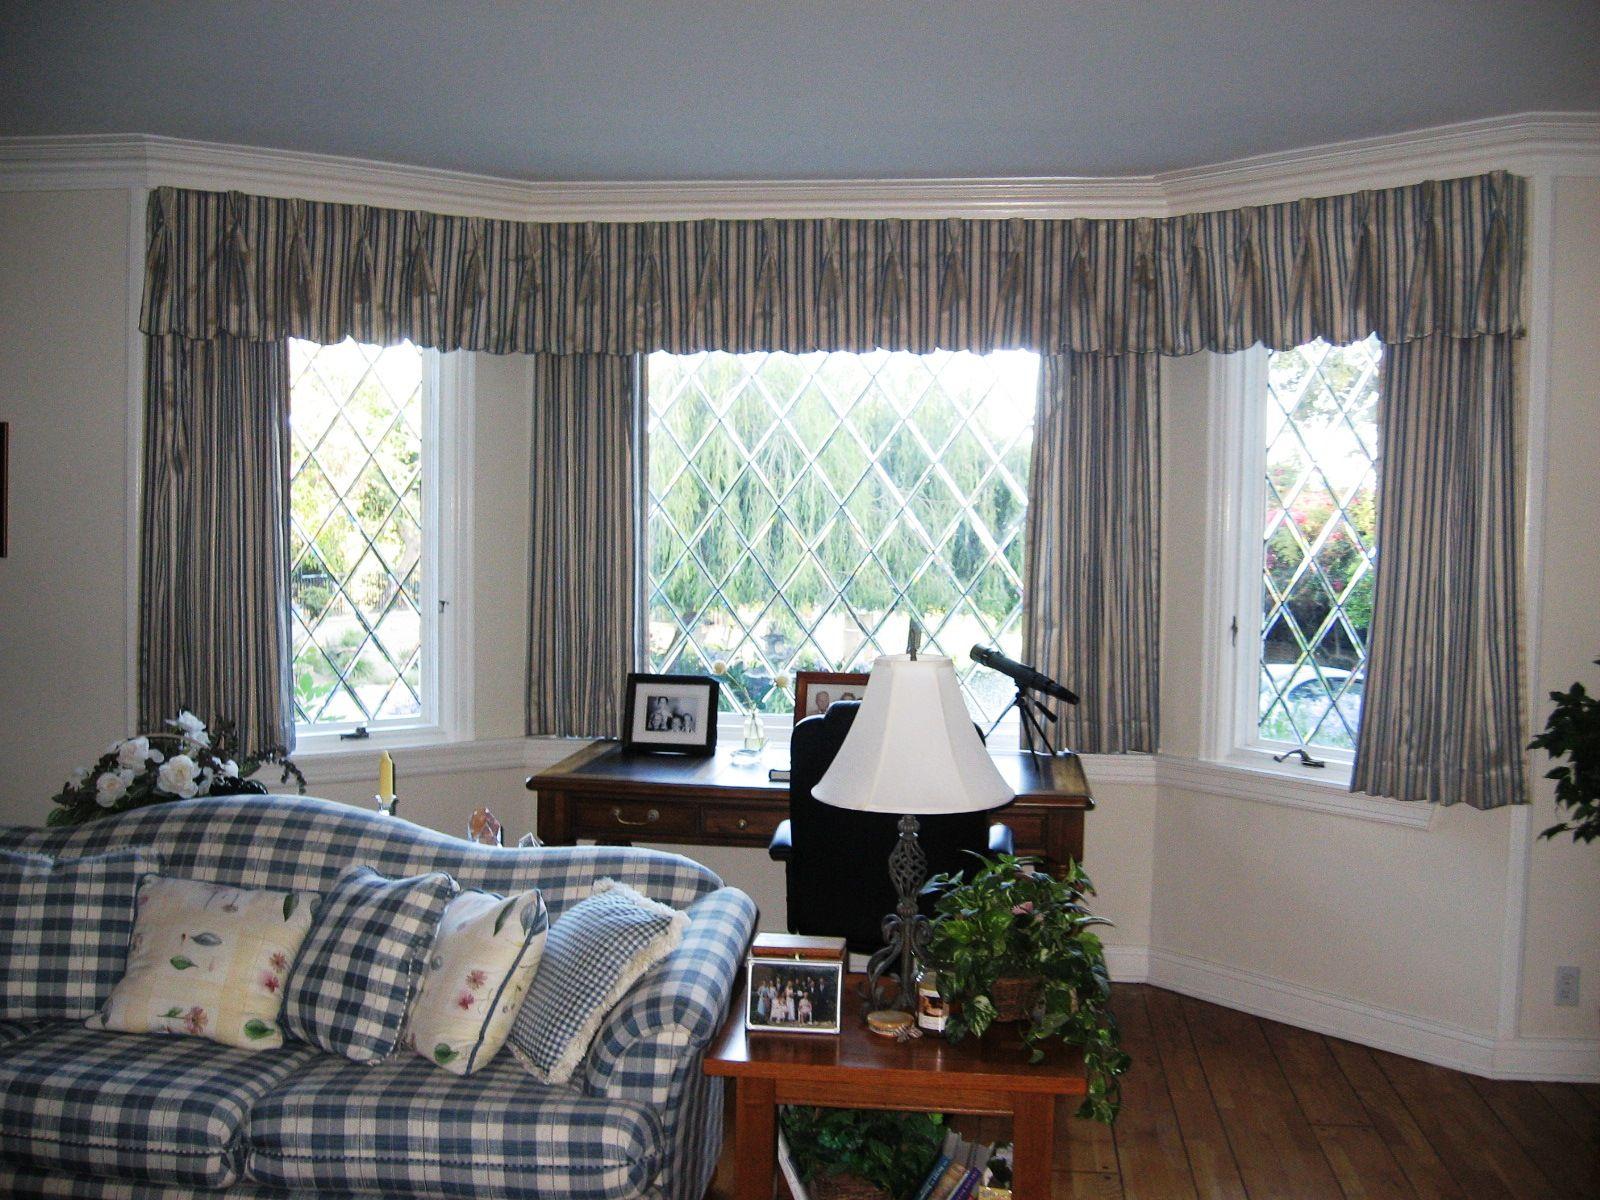 Window treatments for arched bay windows - Images Of Curtains For Arched Bay Windows By Patricia E Haugen Designs